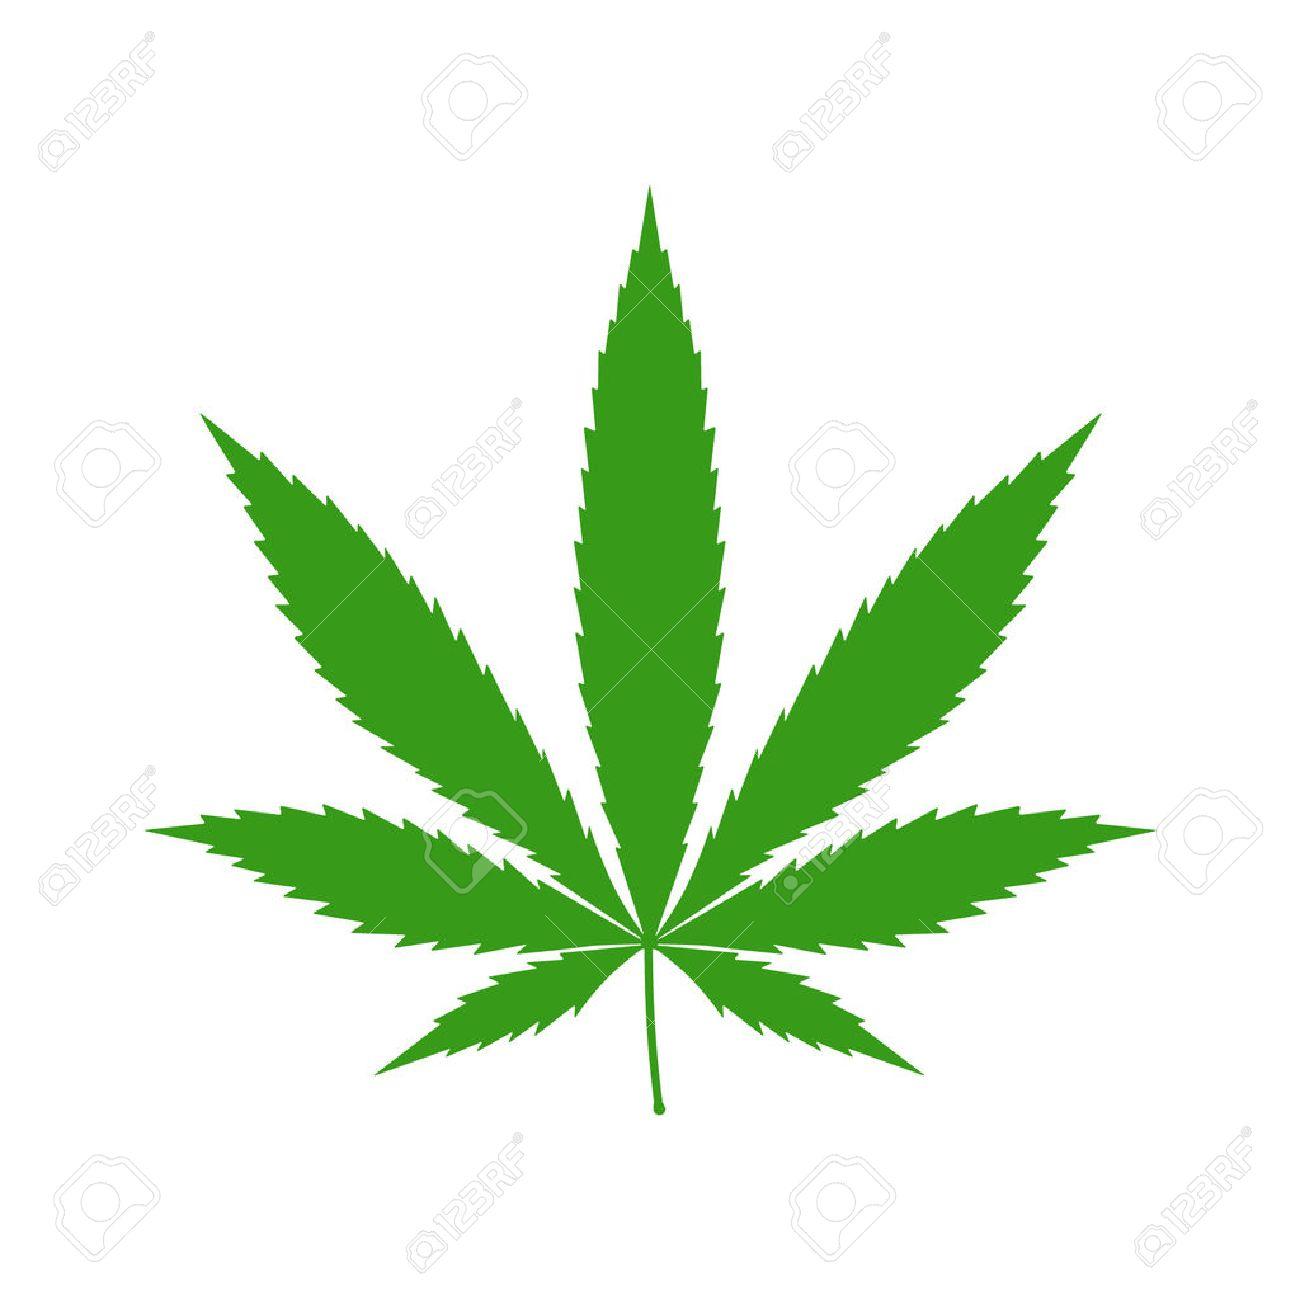 10 470 marijuana cliparts stock vector and royalty free marijuana rh 123rf com marijuana clip art leaf marijuana joint clipart